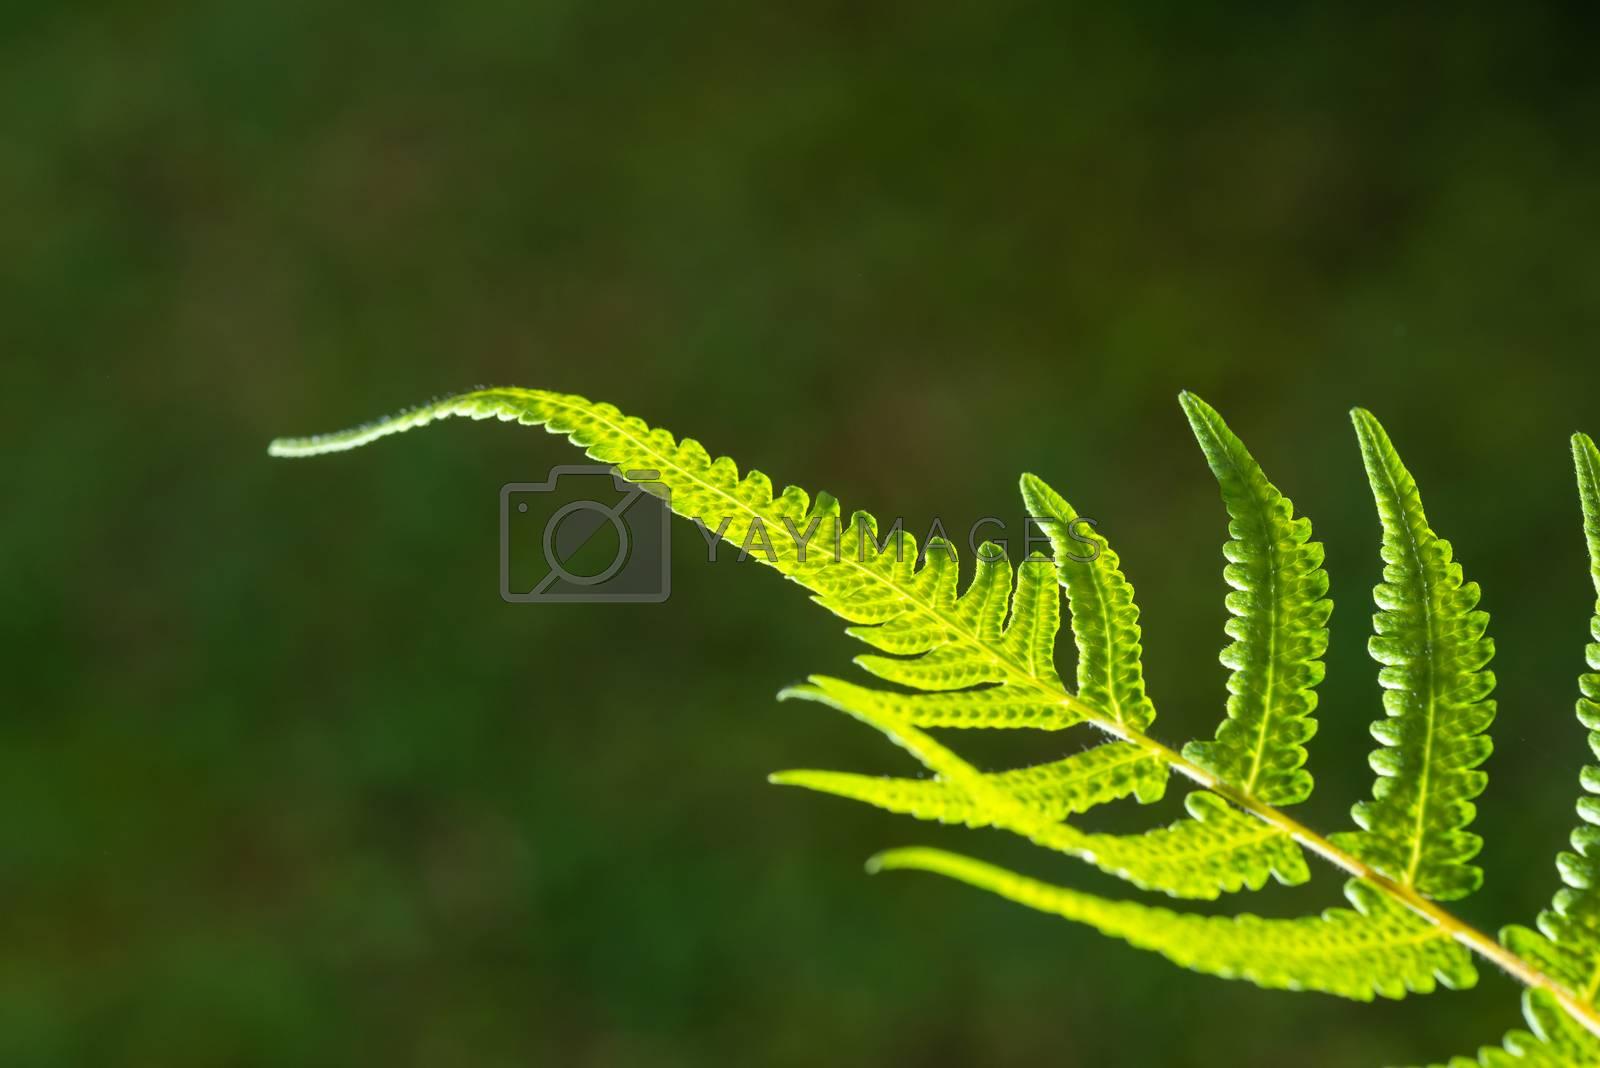 Closeup shot of backlit fern leaf